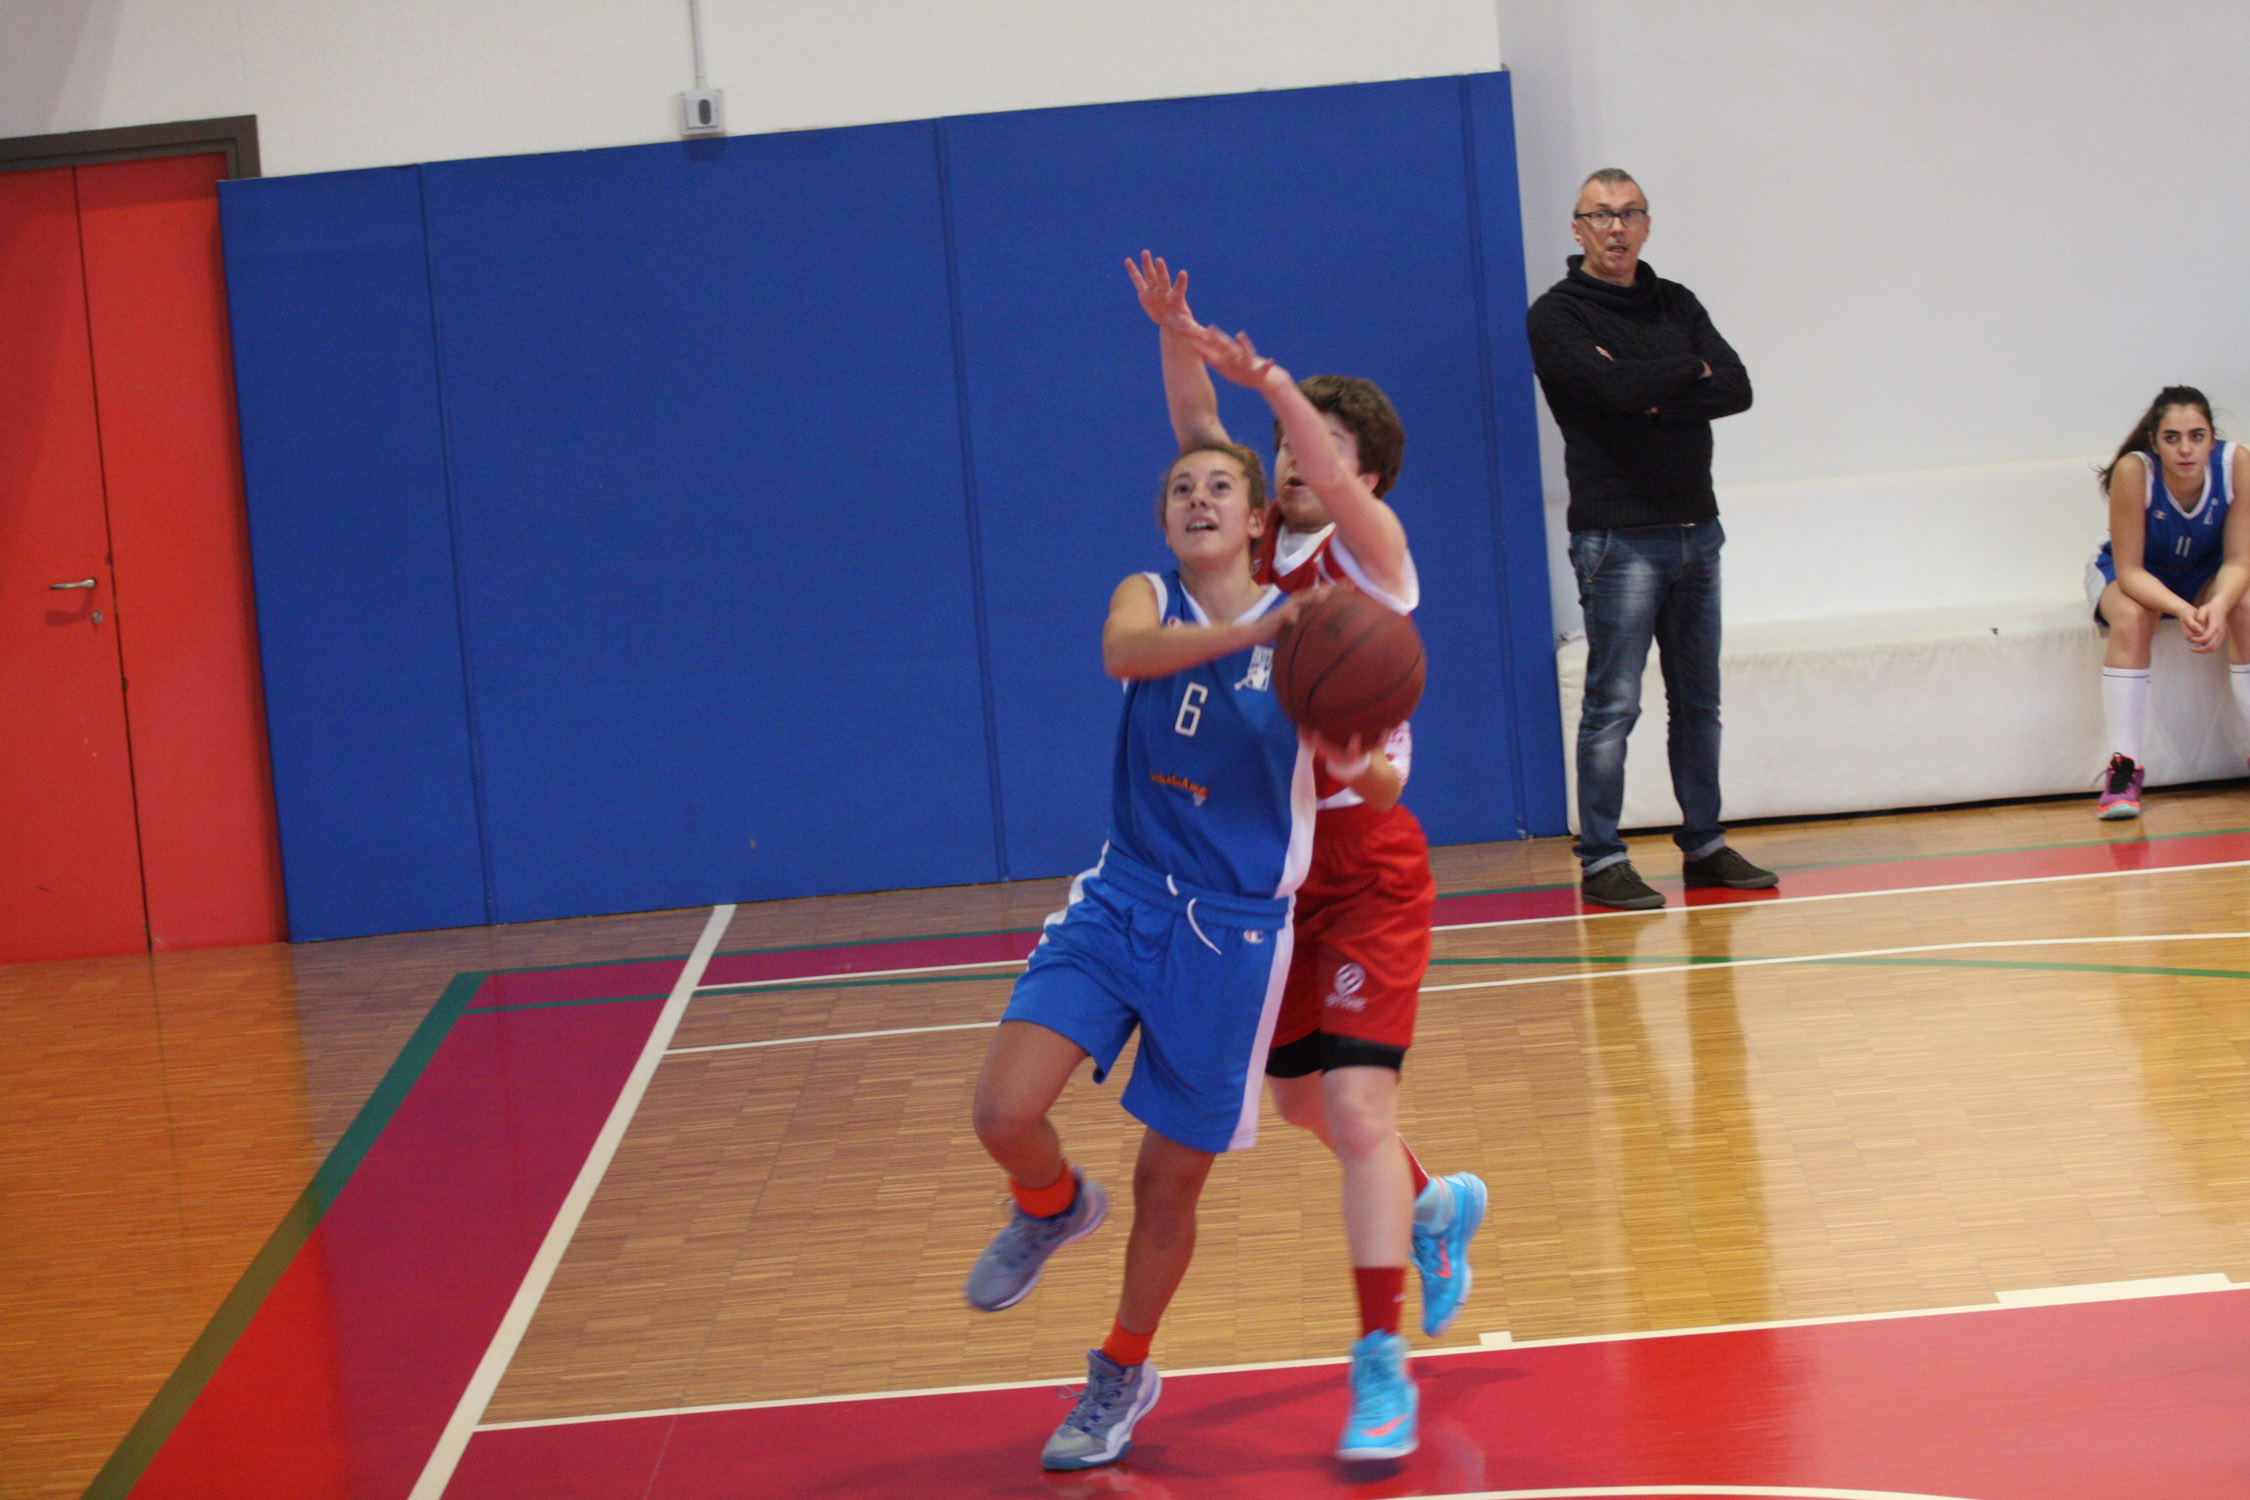 U16E - Costa Masnaga vs Baskettiamo Vittuone 2001 00009.jpg